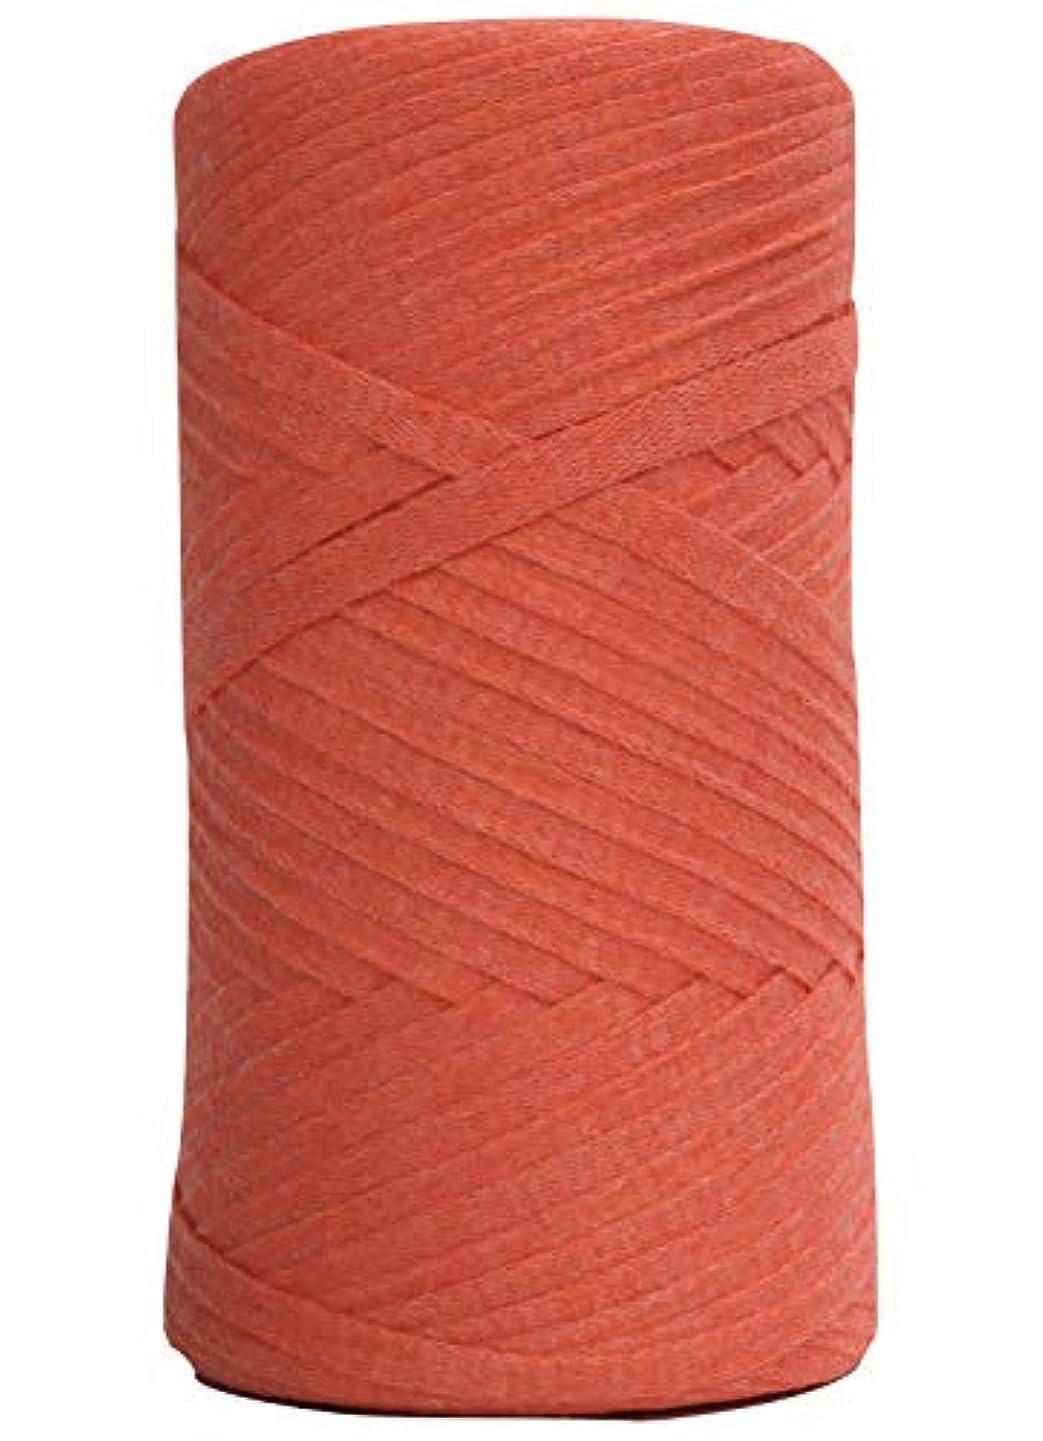 Tape Yarn 150 Yards/Cotton Tape Yarn/Bulky Yarn/Fast Track/Crochet/Knitting Yarn/XL Yarn/Modern Crochet/Ribbon Yarn (Orange)